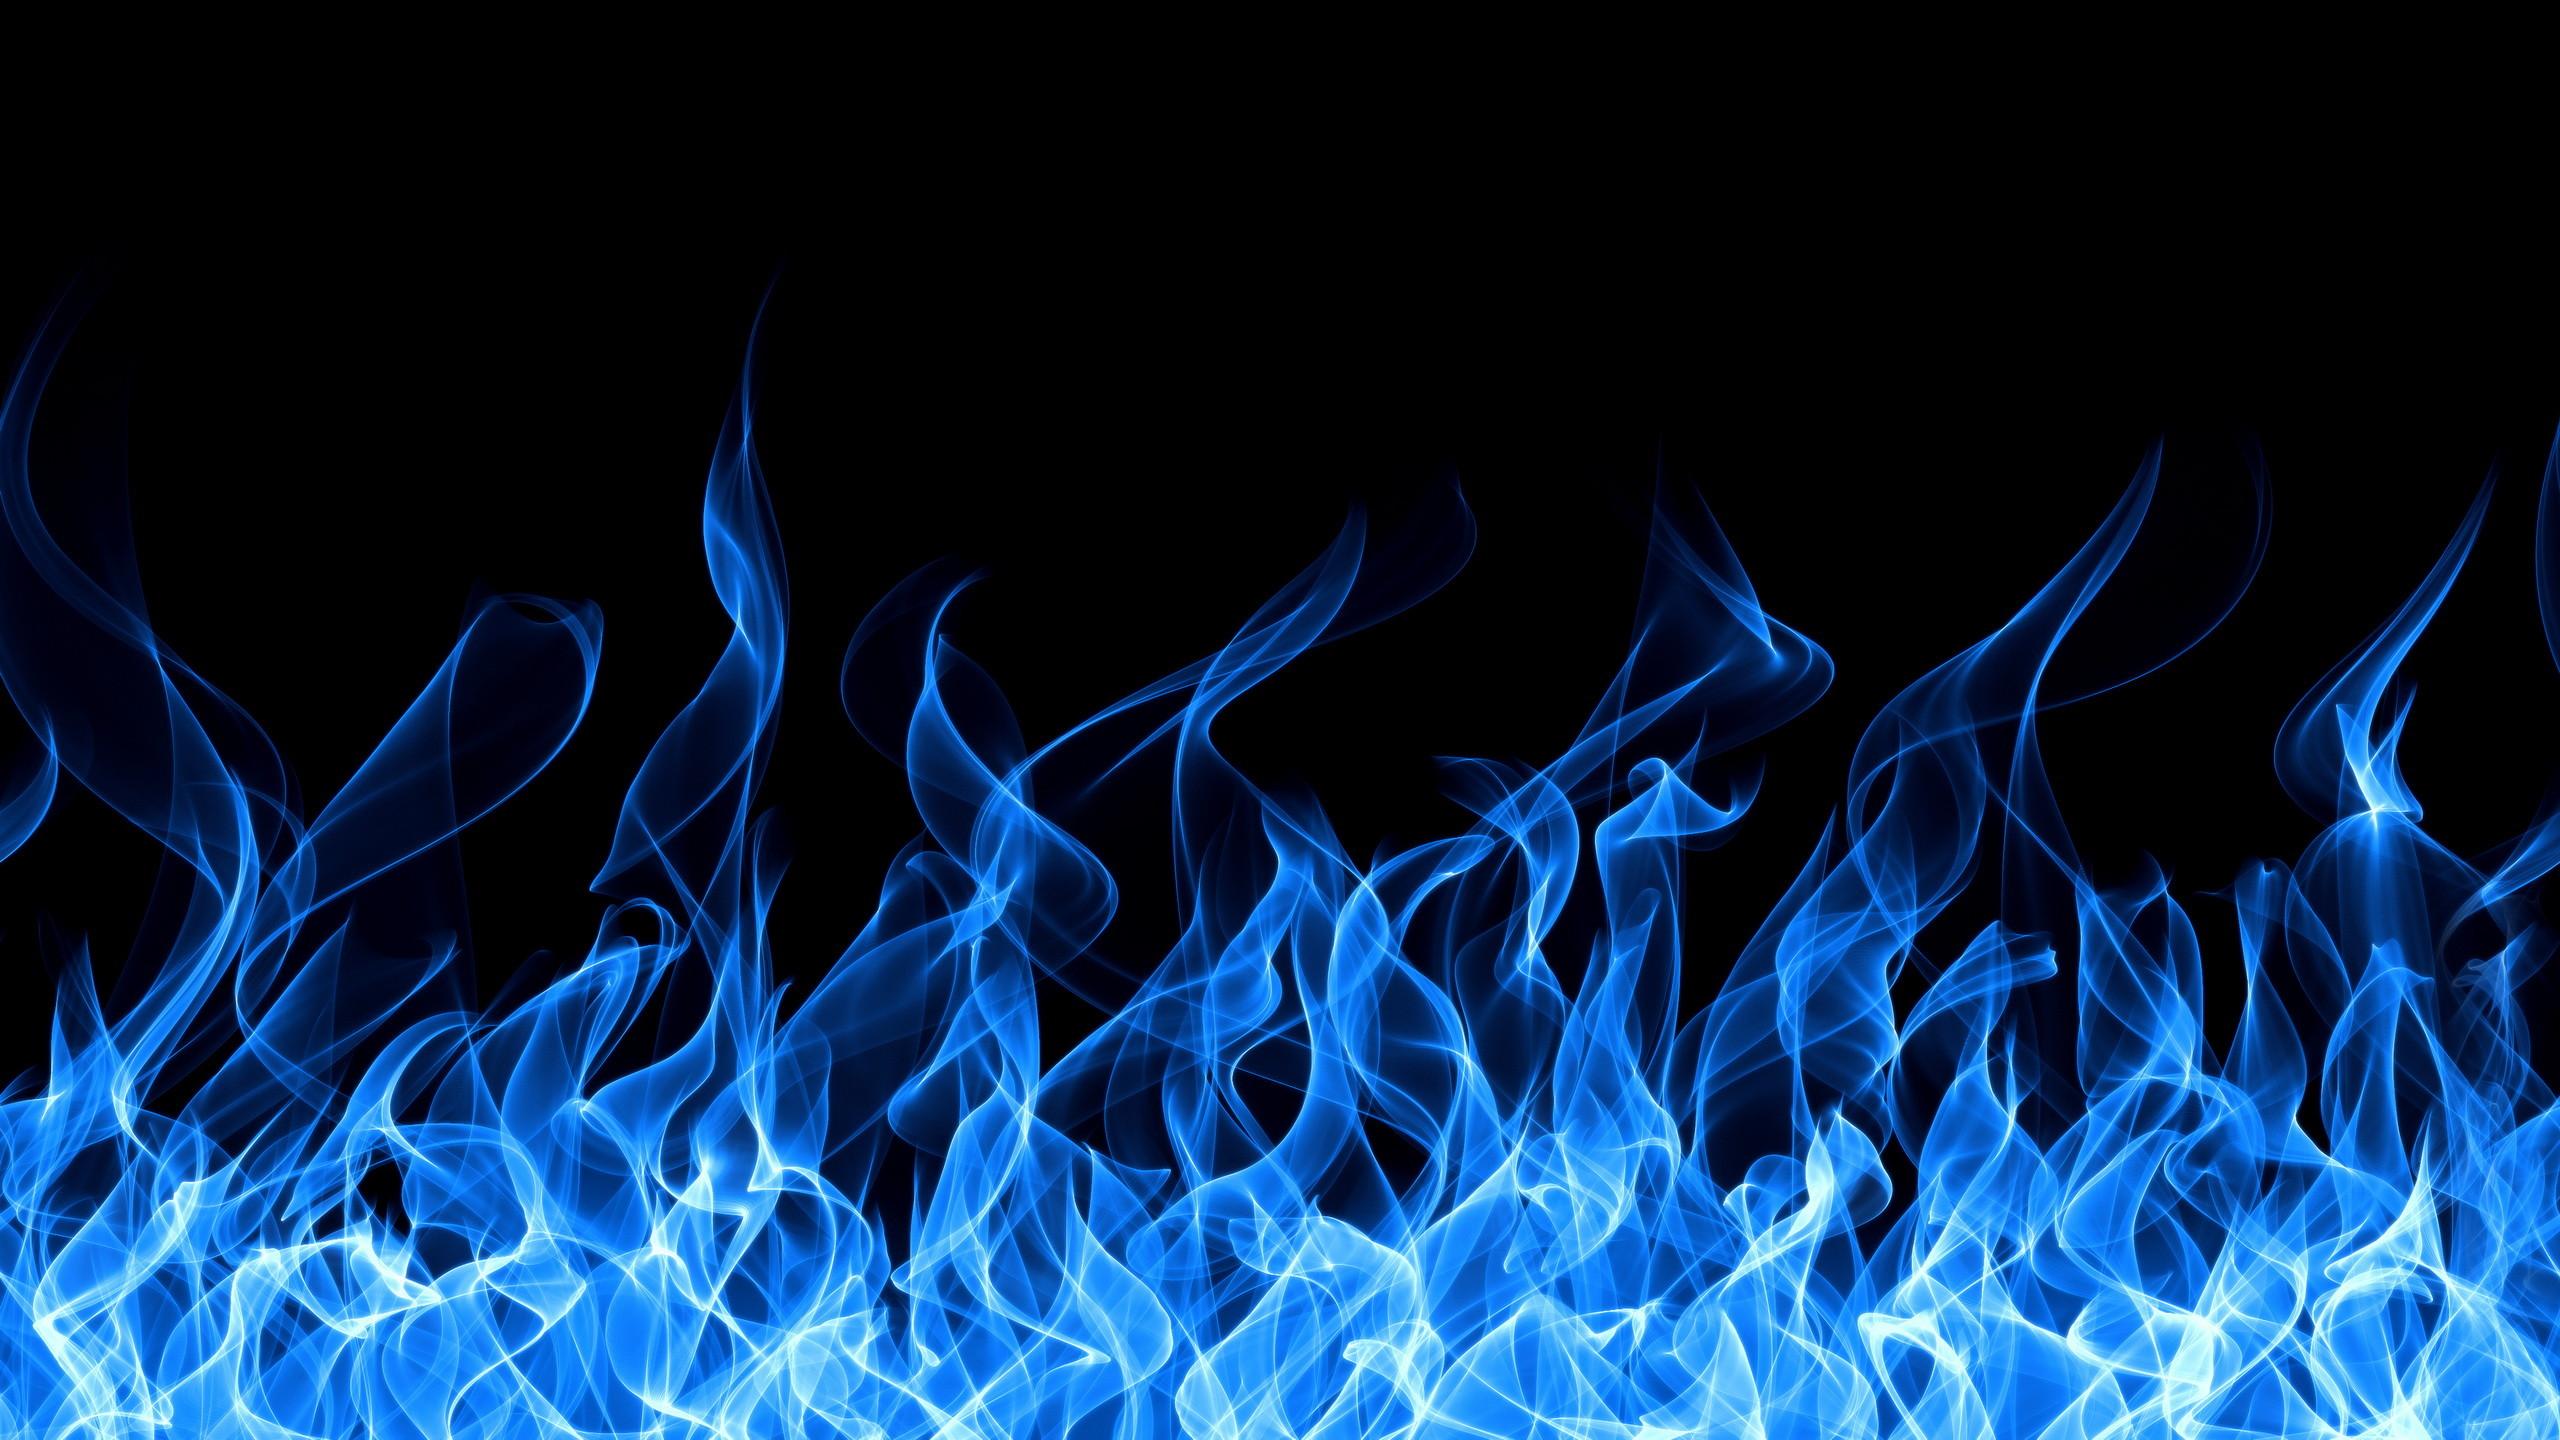 HD Wallpaper   Background ID:596502. Pattern Flame